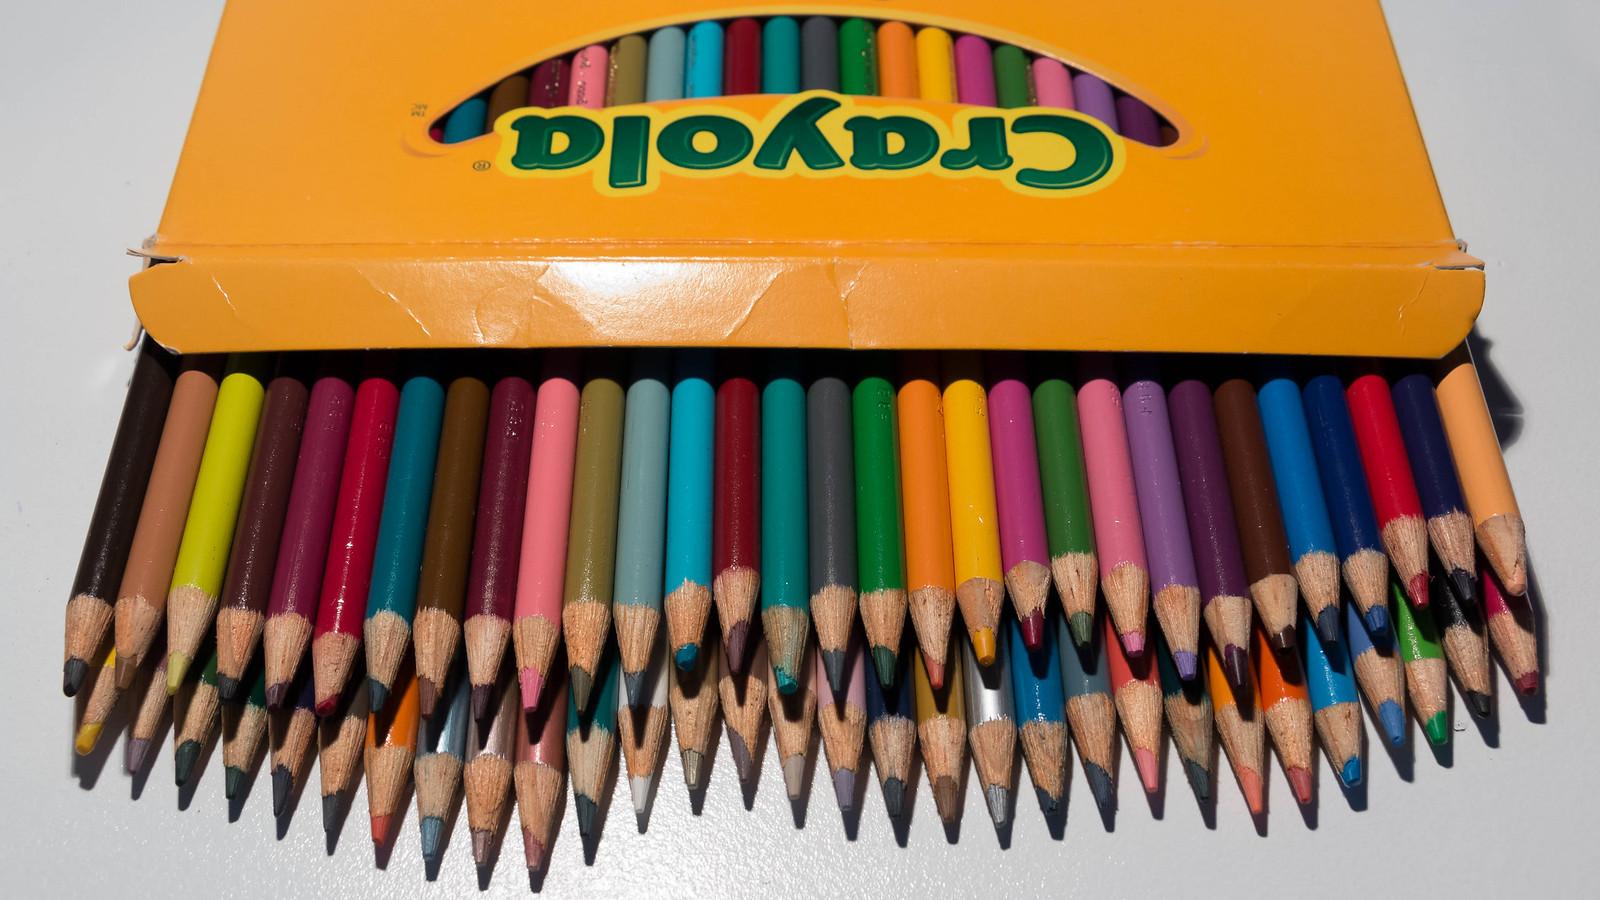 crayola 60